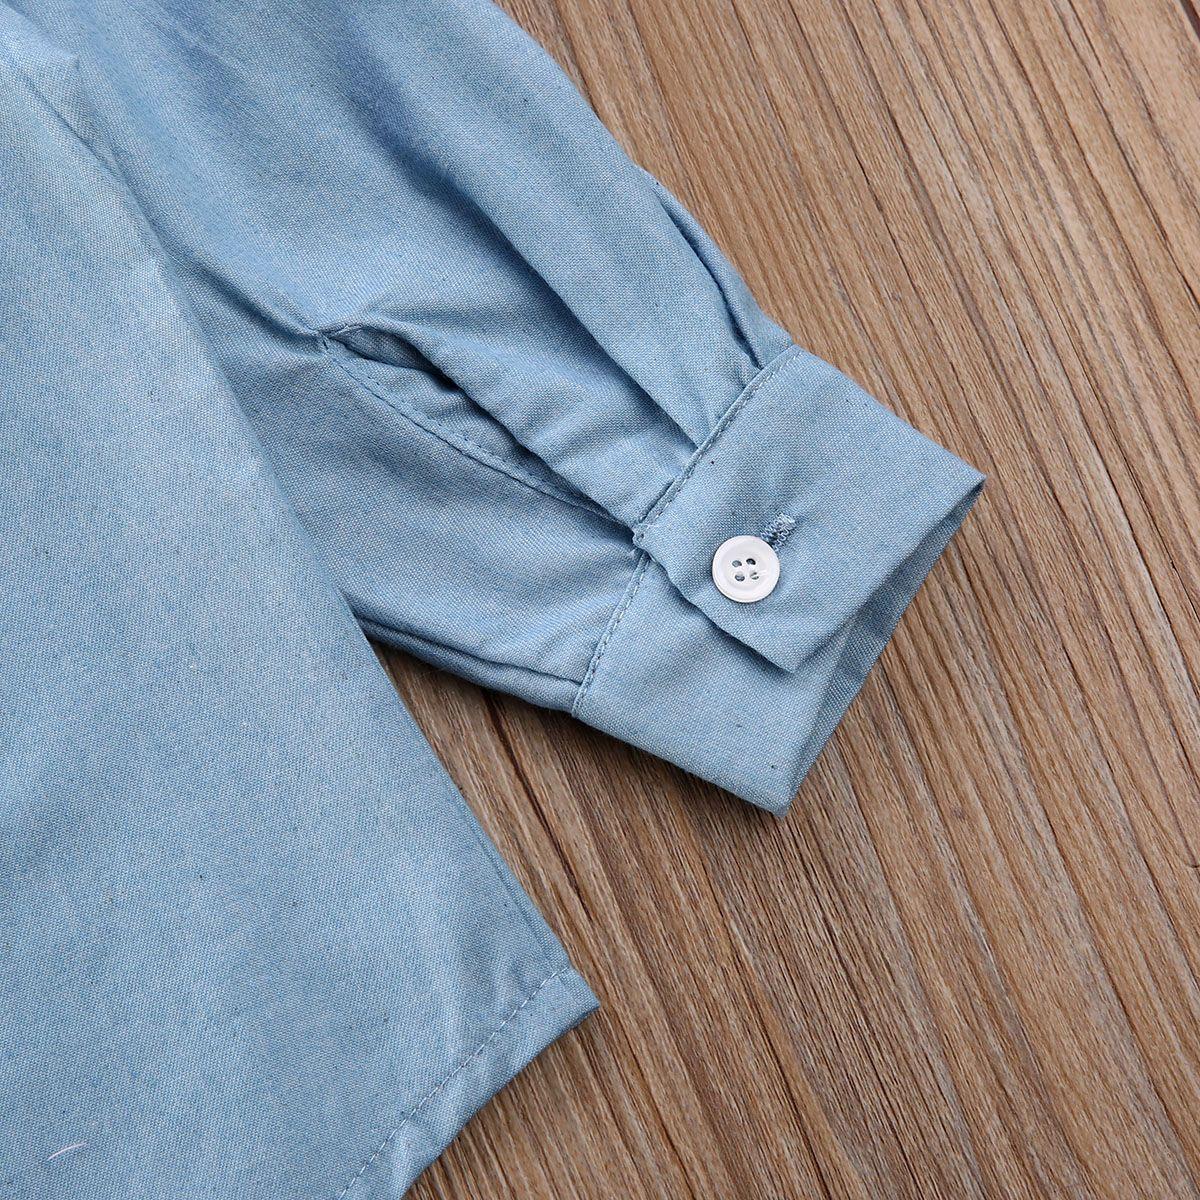 Pudcoco Infant Kid Baby Girl 2T-7T Denim Jacket Tops Shirt Letter Print Blue Long Sleeve Coat Shirt